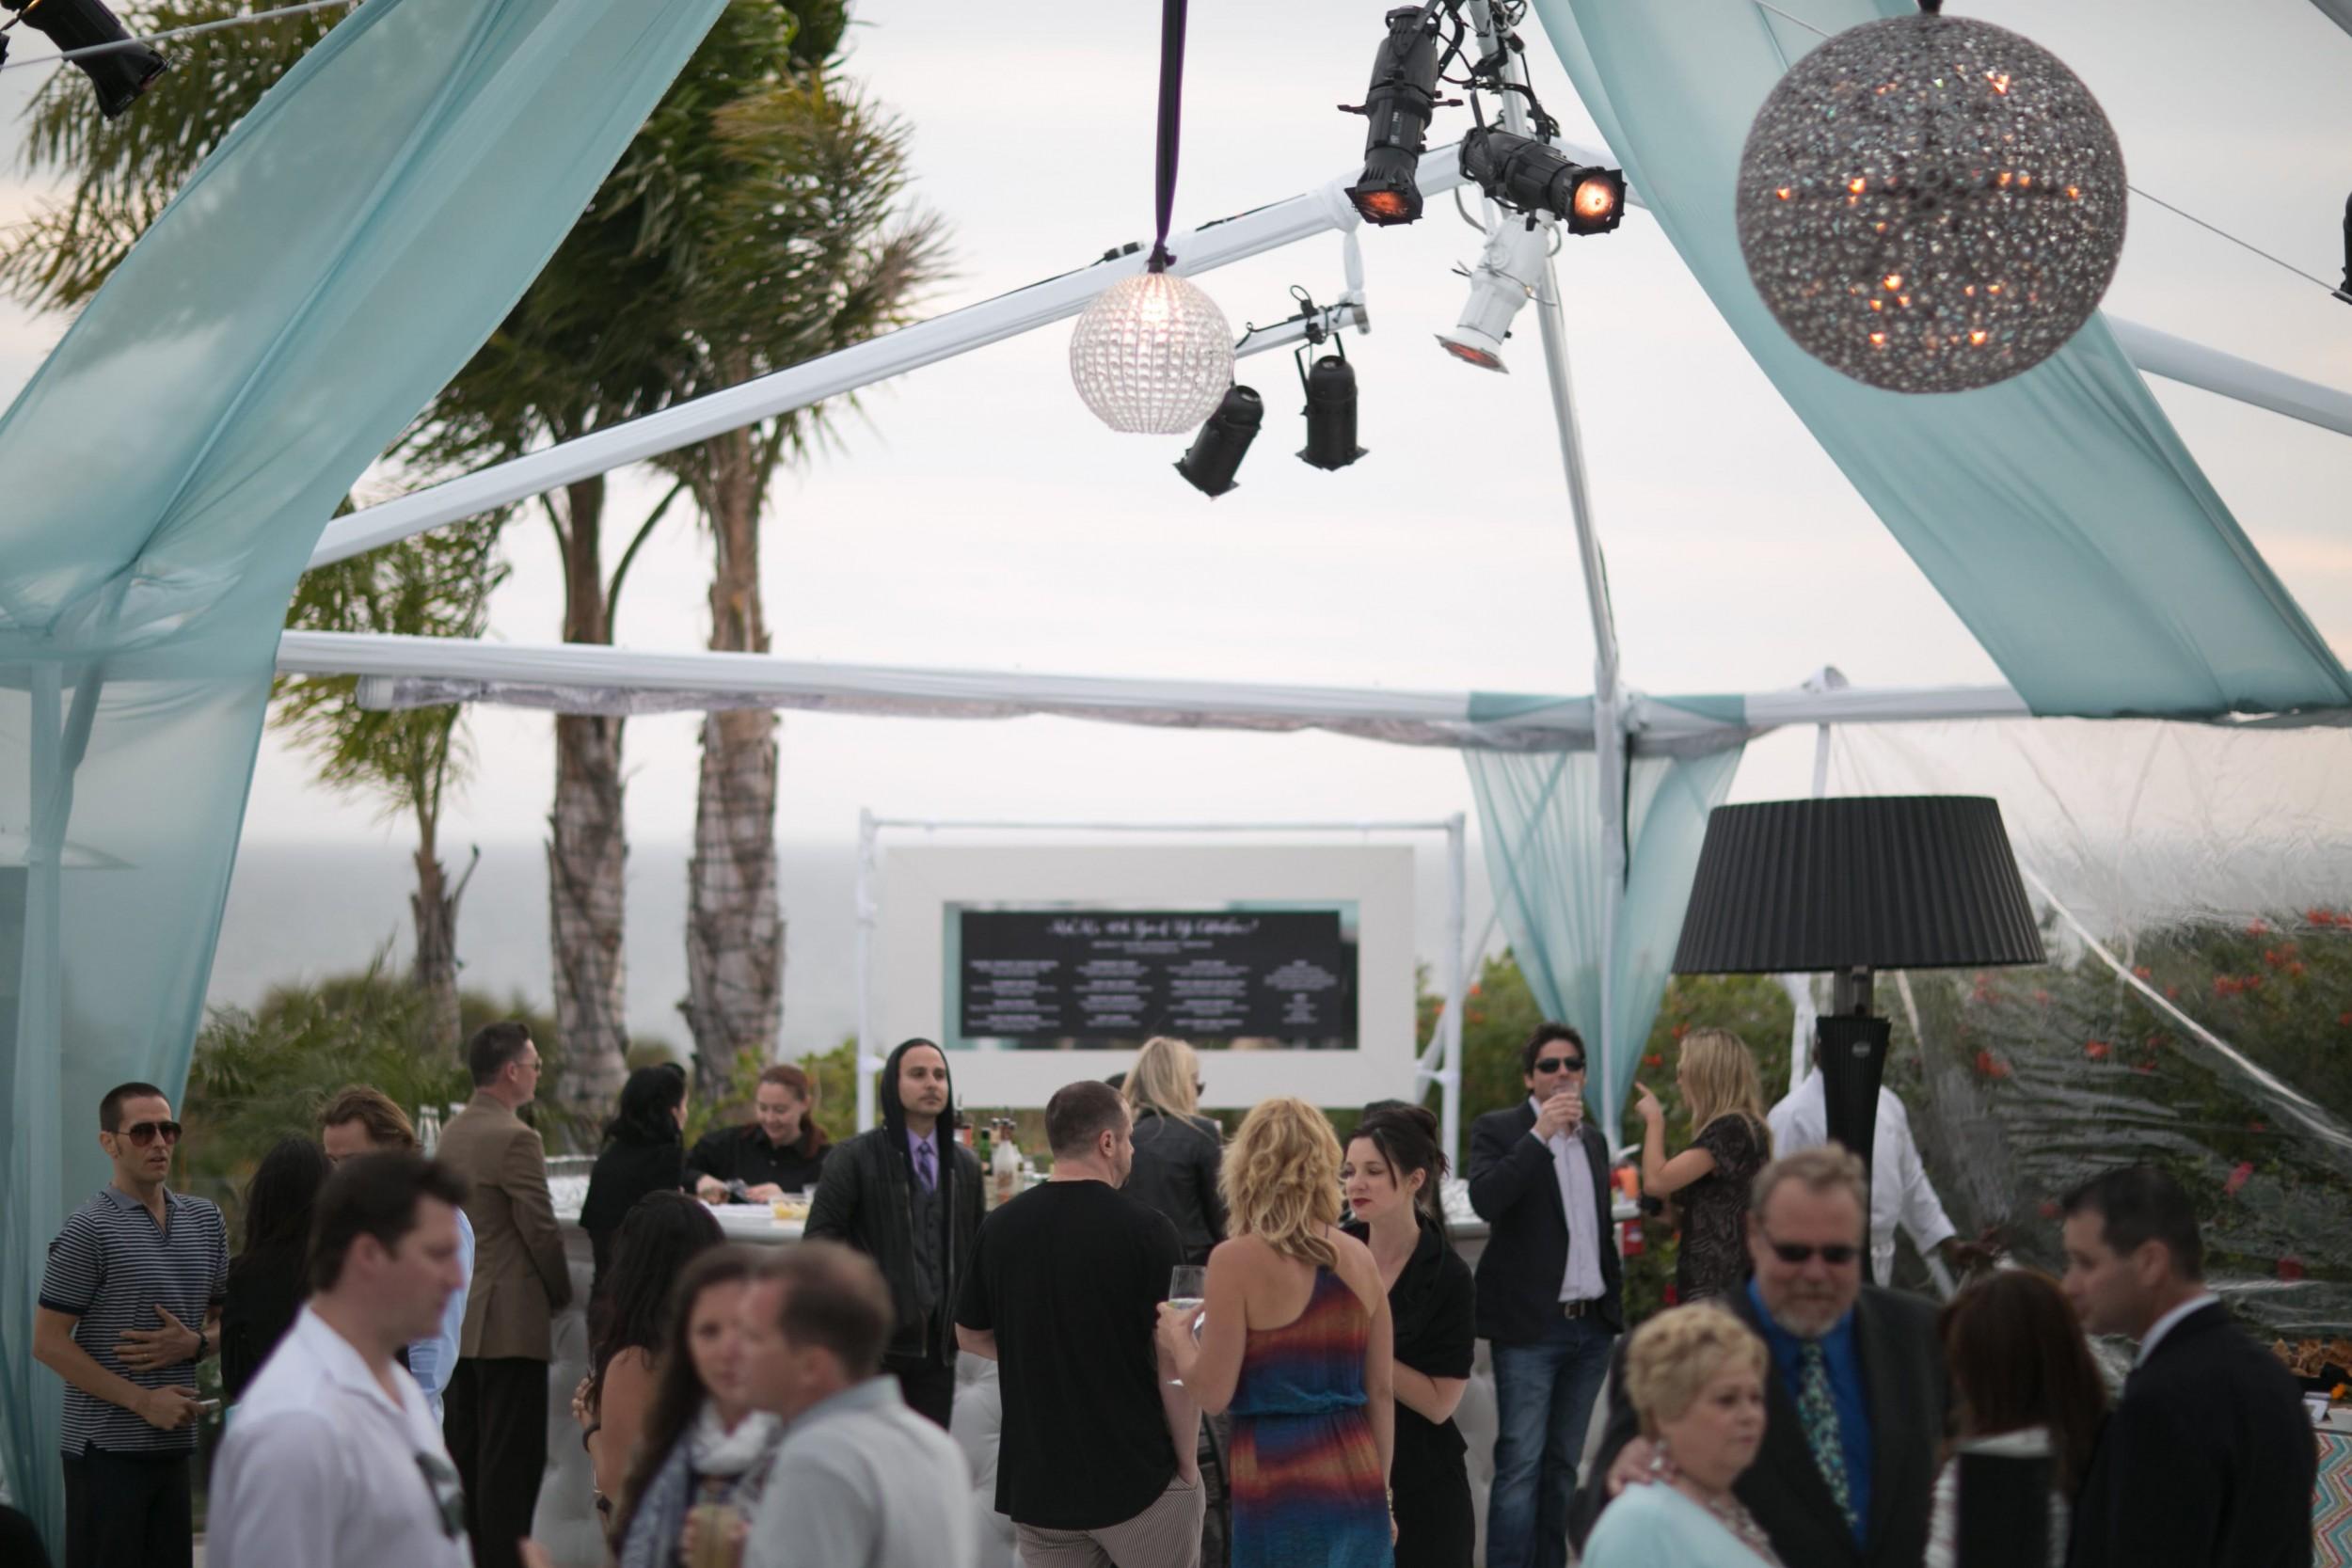 40th birthday party dancing floor